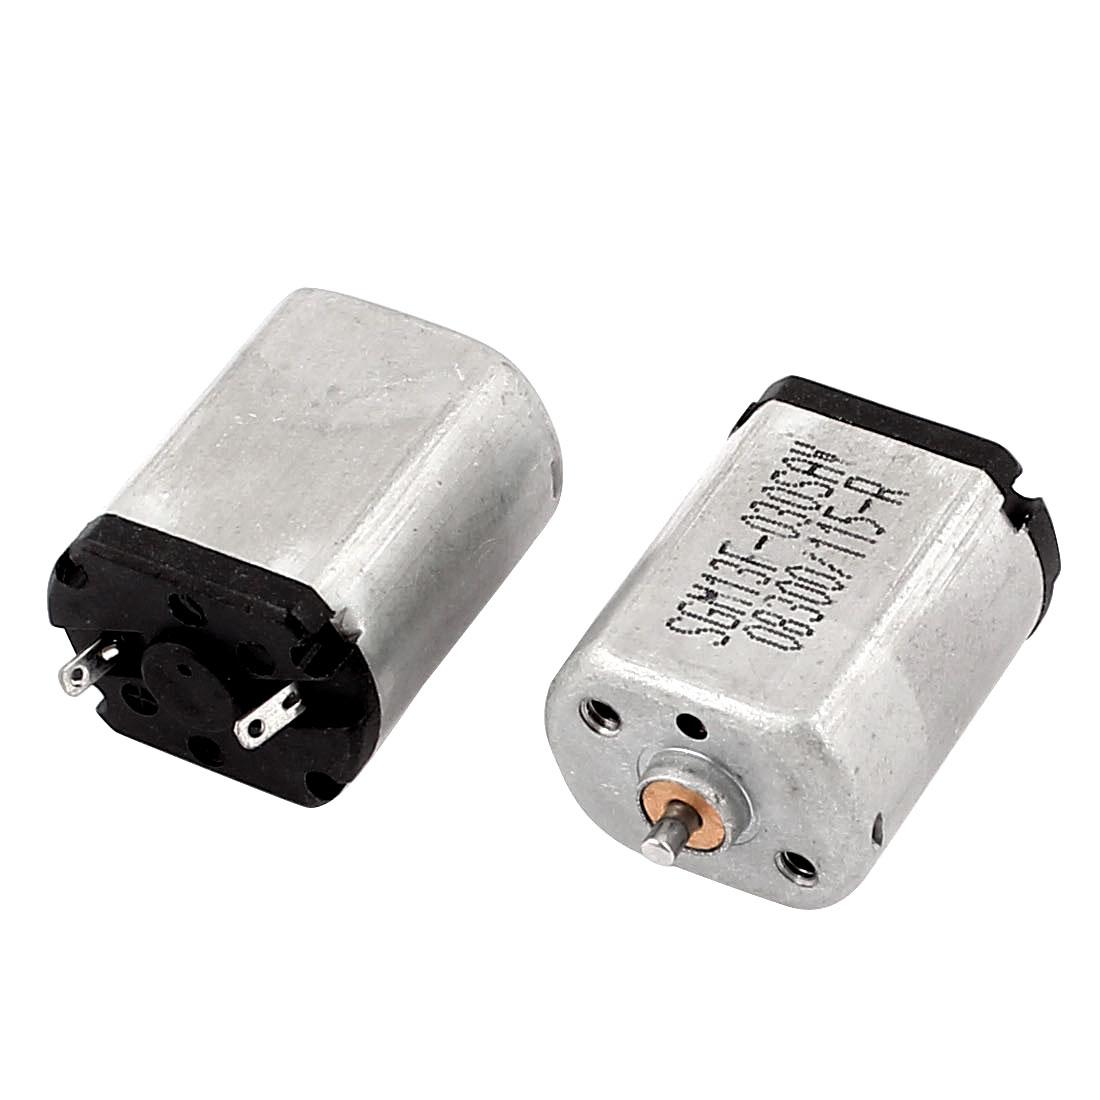 2 Pcs DC 6V 12800RPM Rotary Speed 1.5mm Shaft Dia Mini Motor for DIY Toy